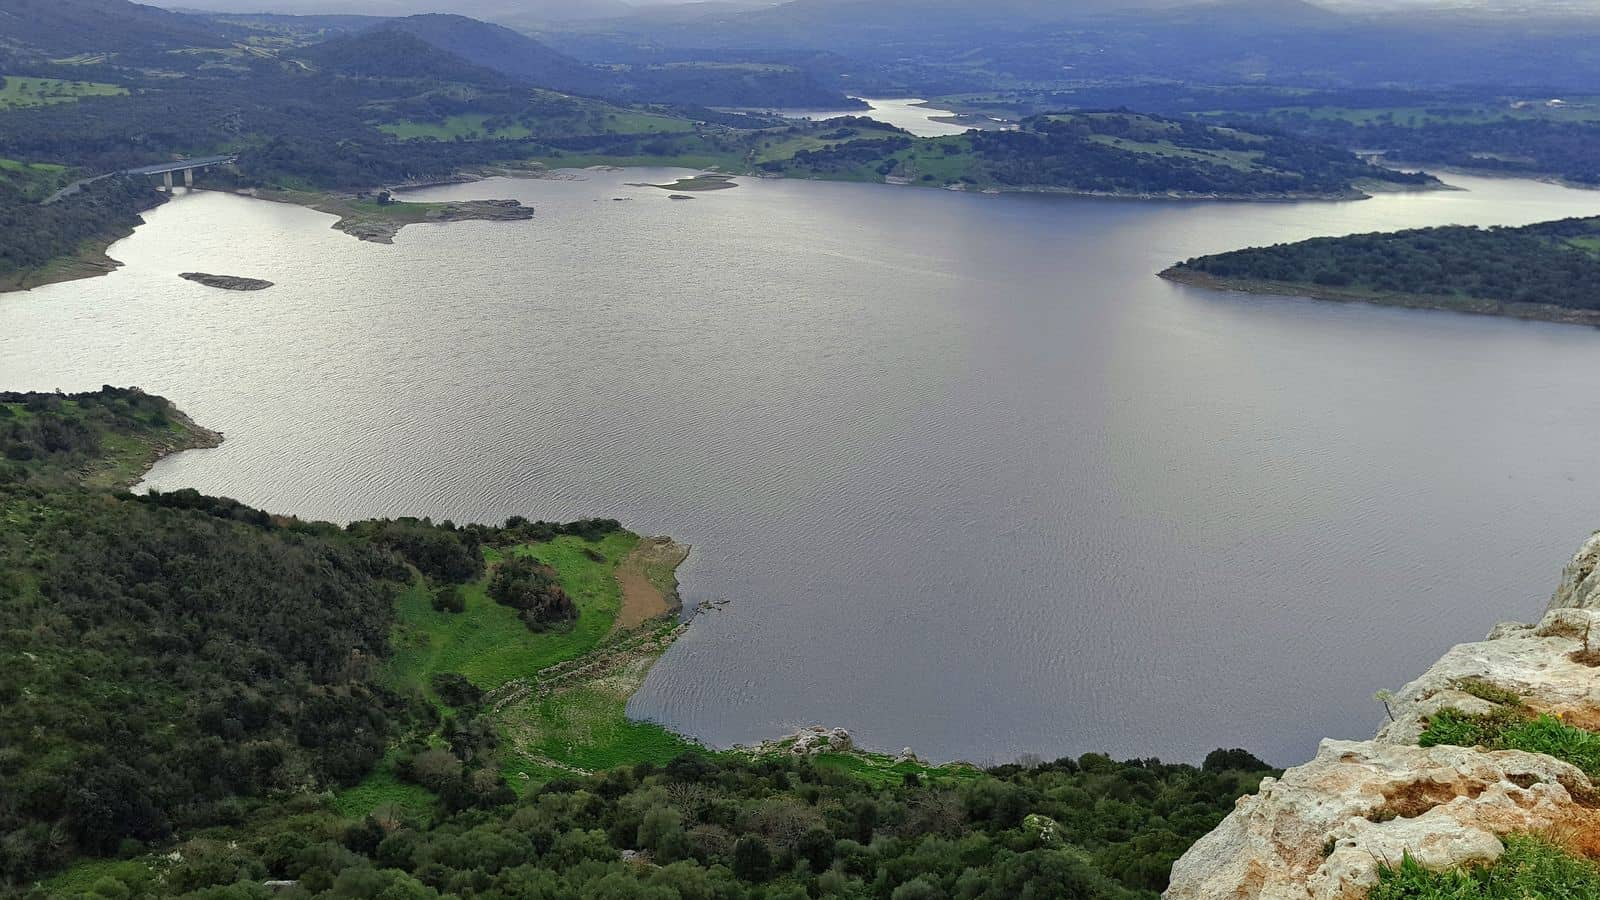 montelone_rocca_doria_sardegna_lago_temo.1